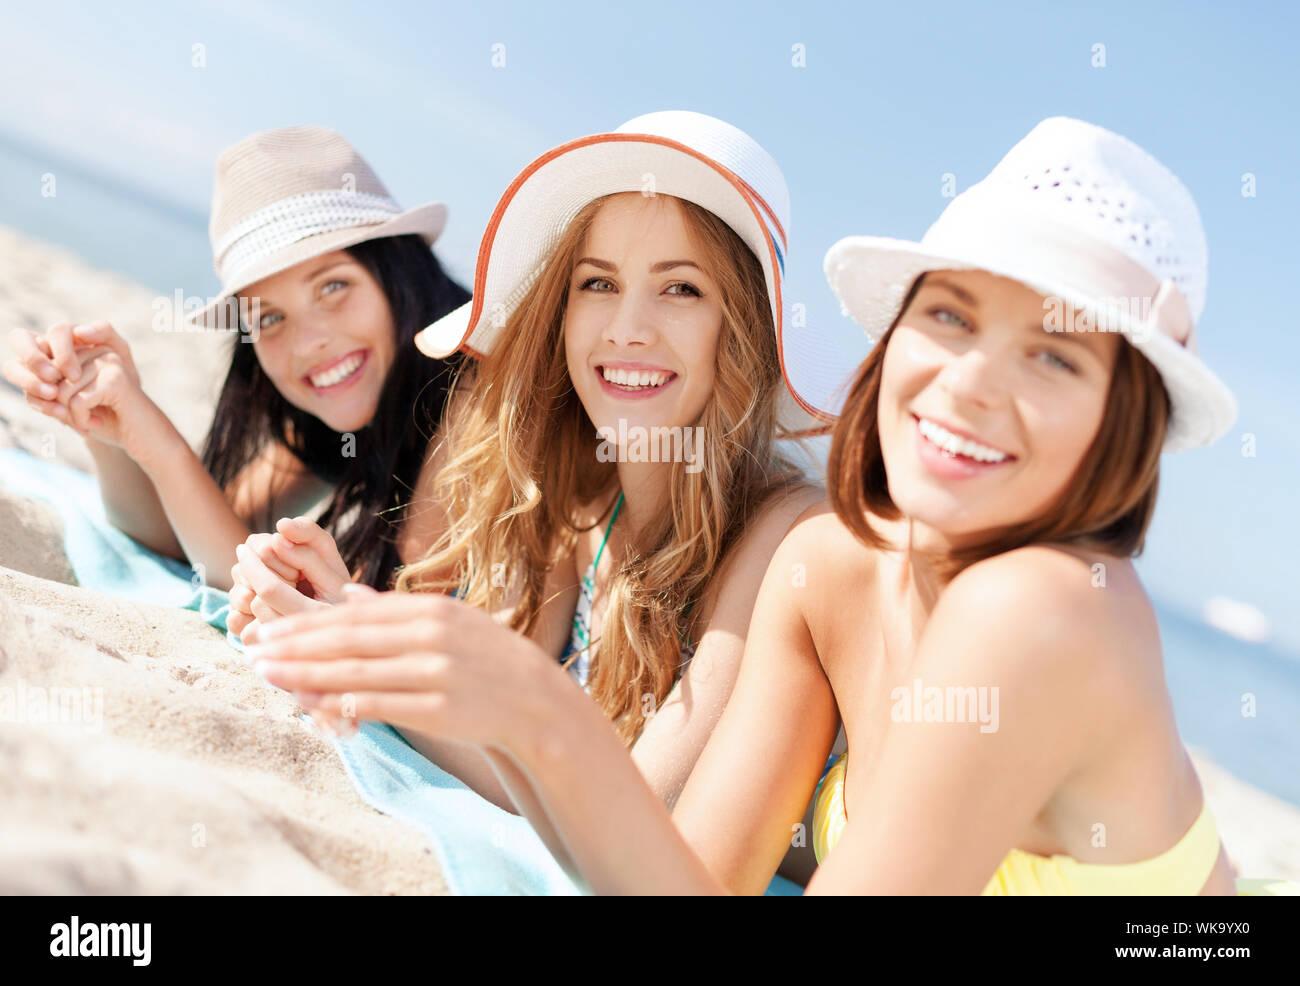 summer holidays and vacation - girls in bikinis sunbathing on the beach Stock Photo